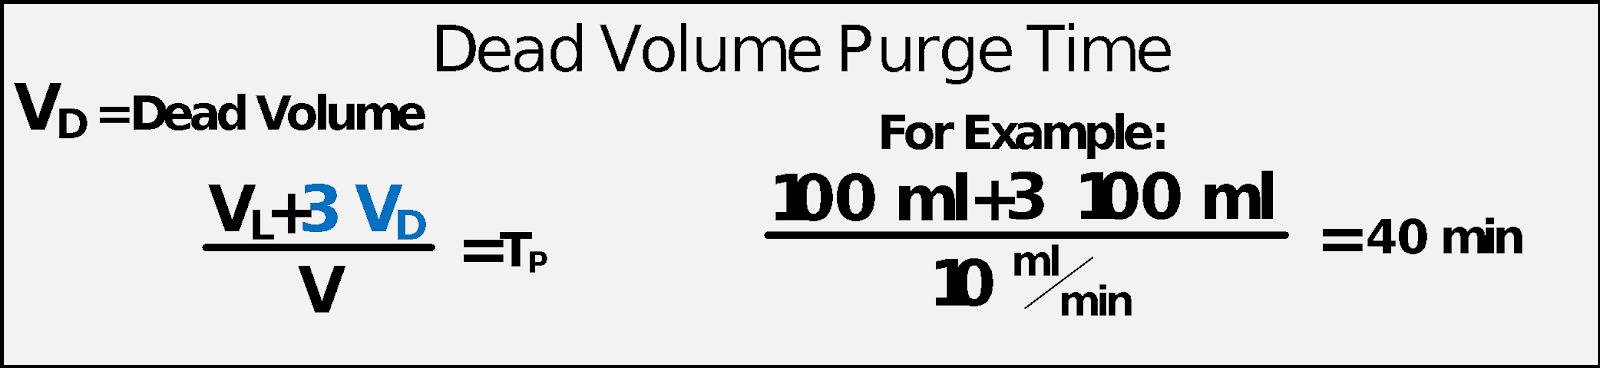 Dead Volume Purge Time